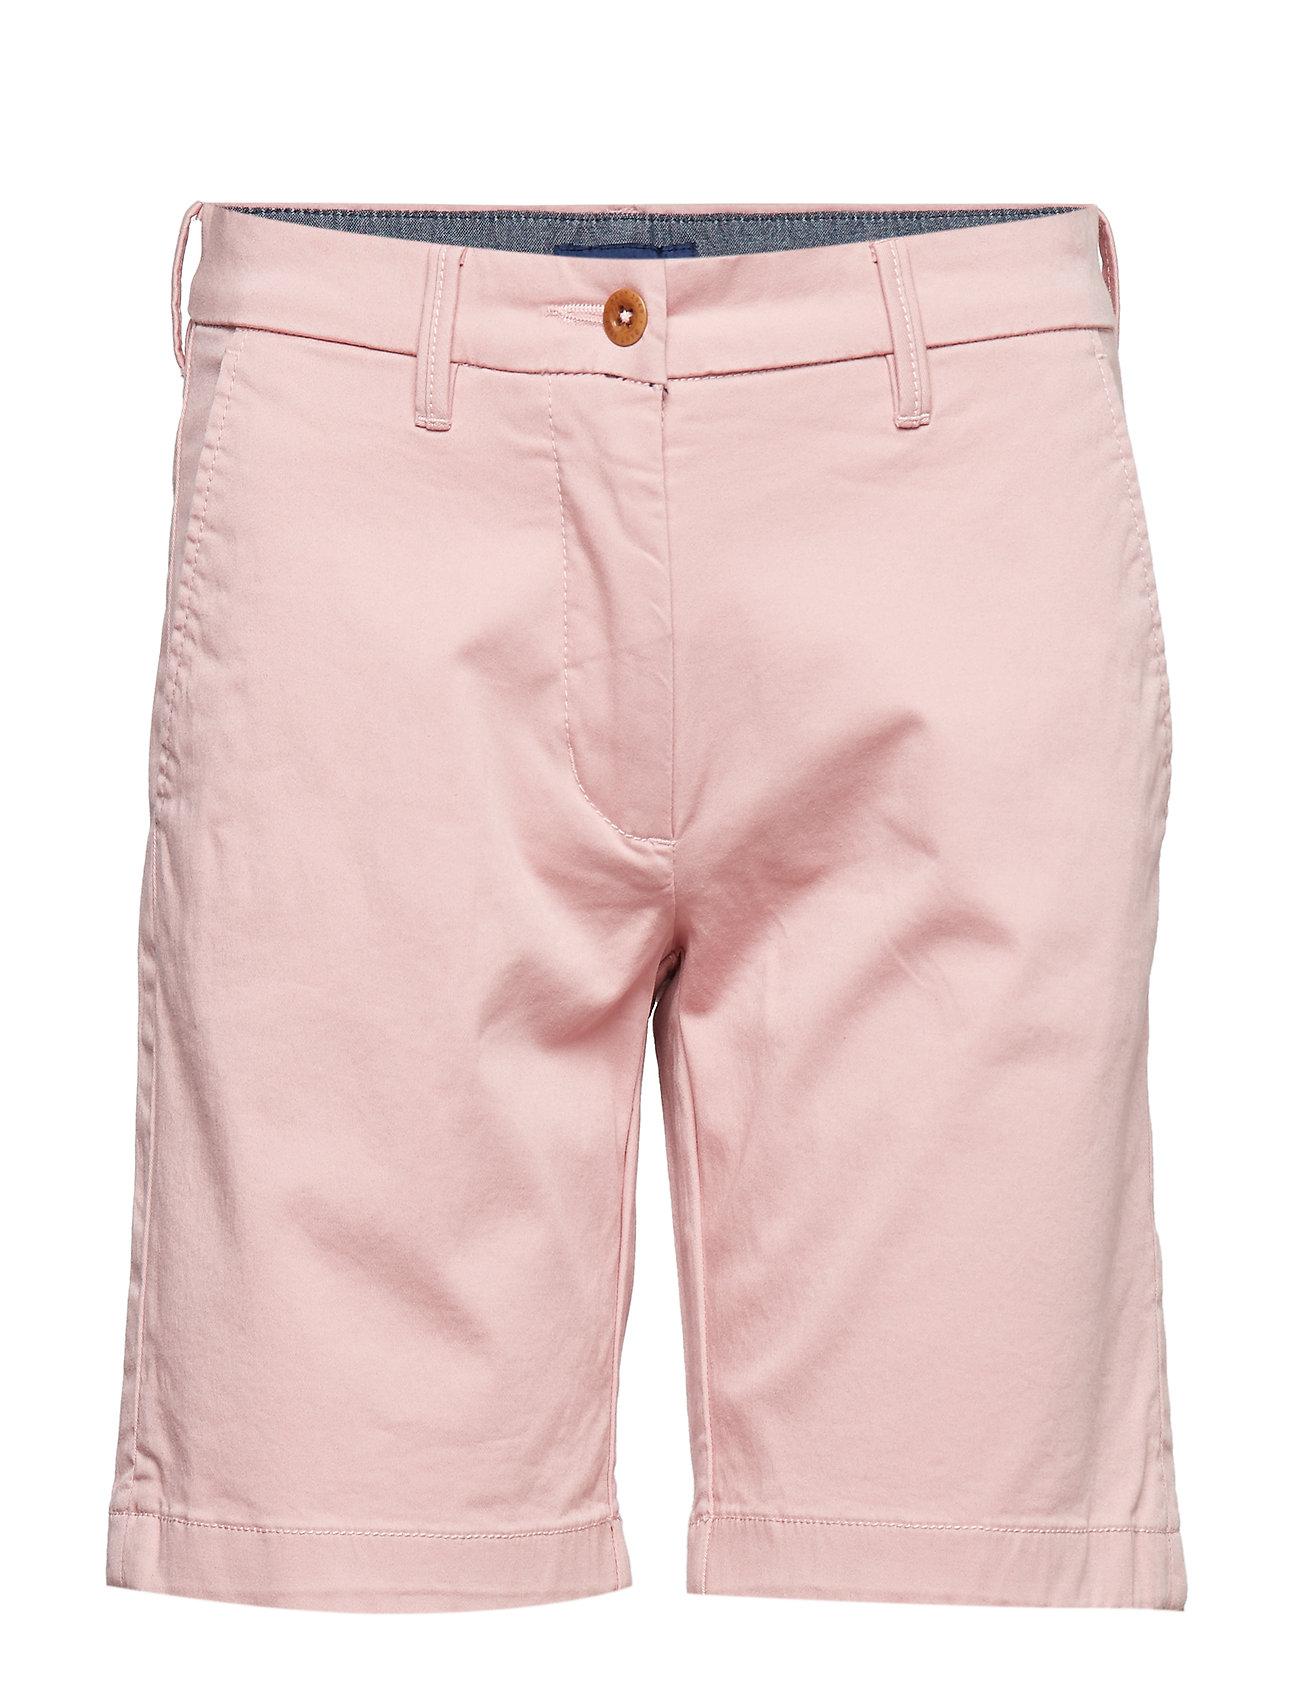 Image of O1. Classic Chino Shorts Bermudashorts Shorts Lyserød GANT (3131509941)